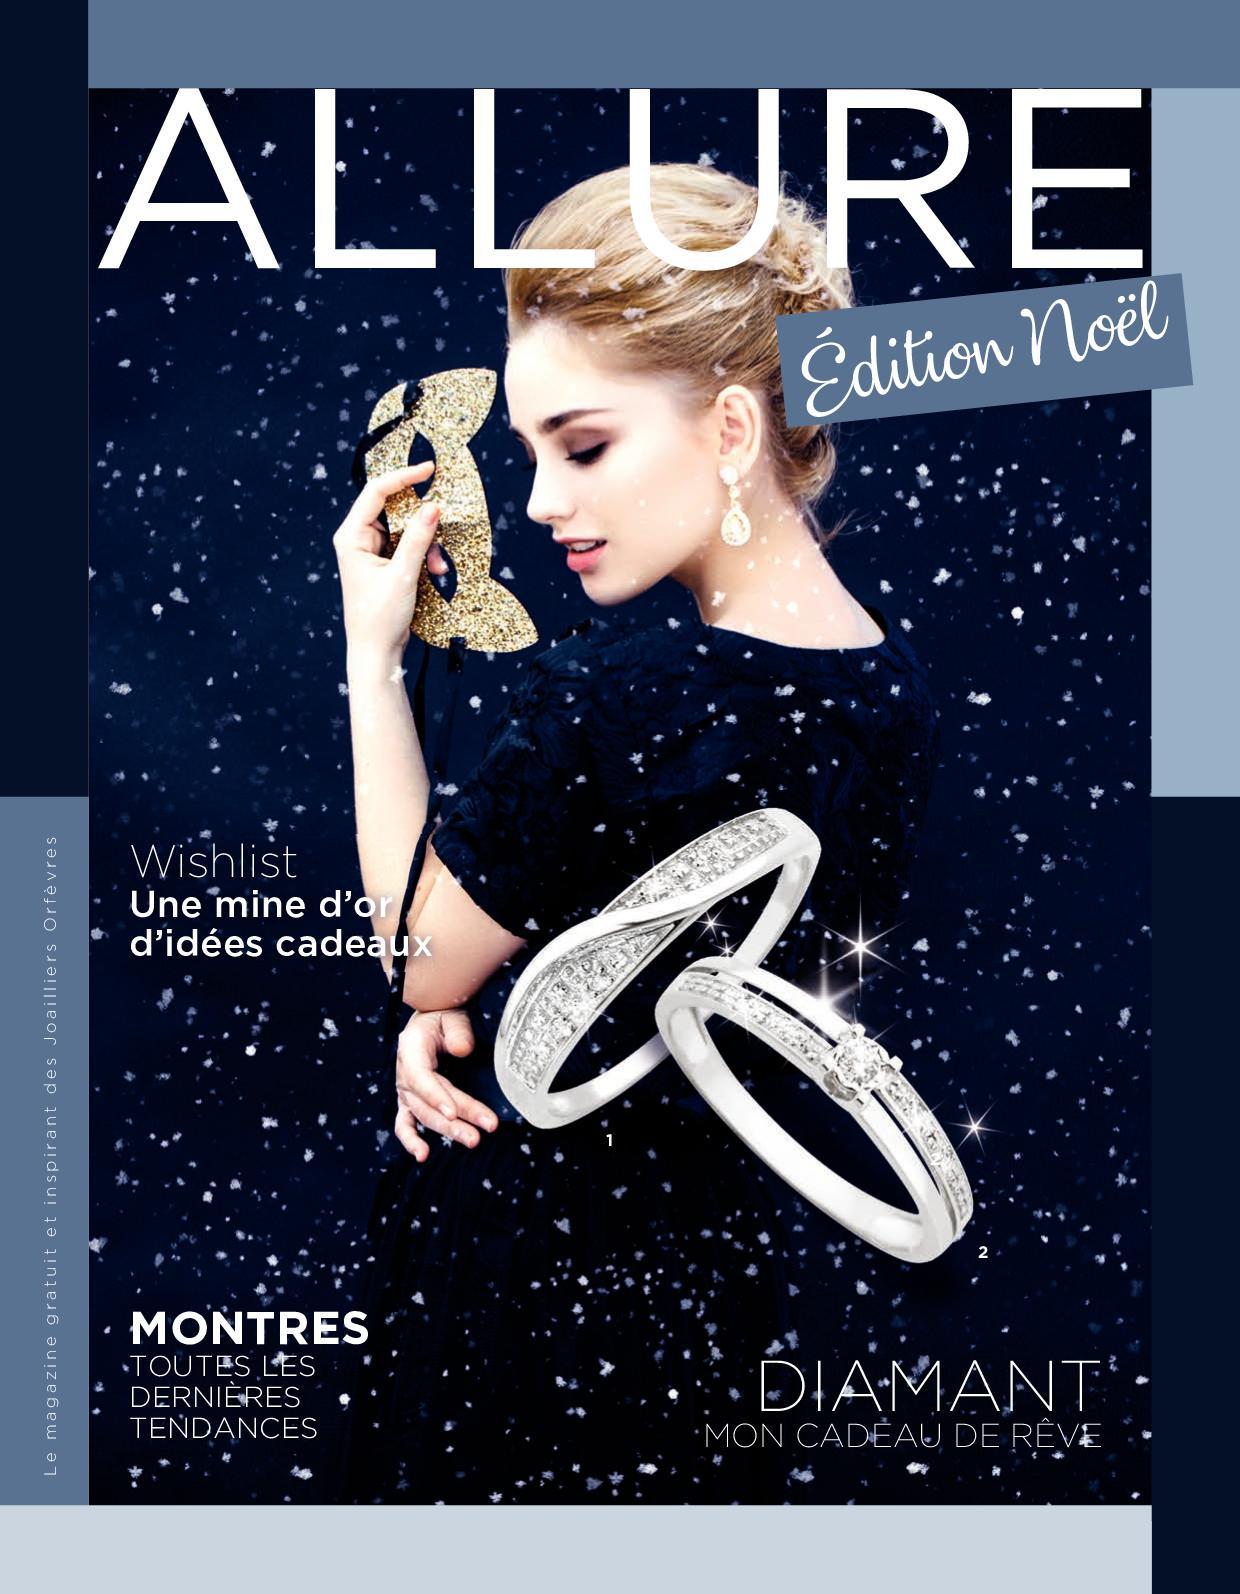 Christian Miche - Catalogue Noël 2018